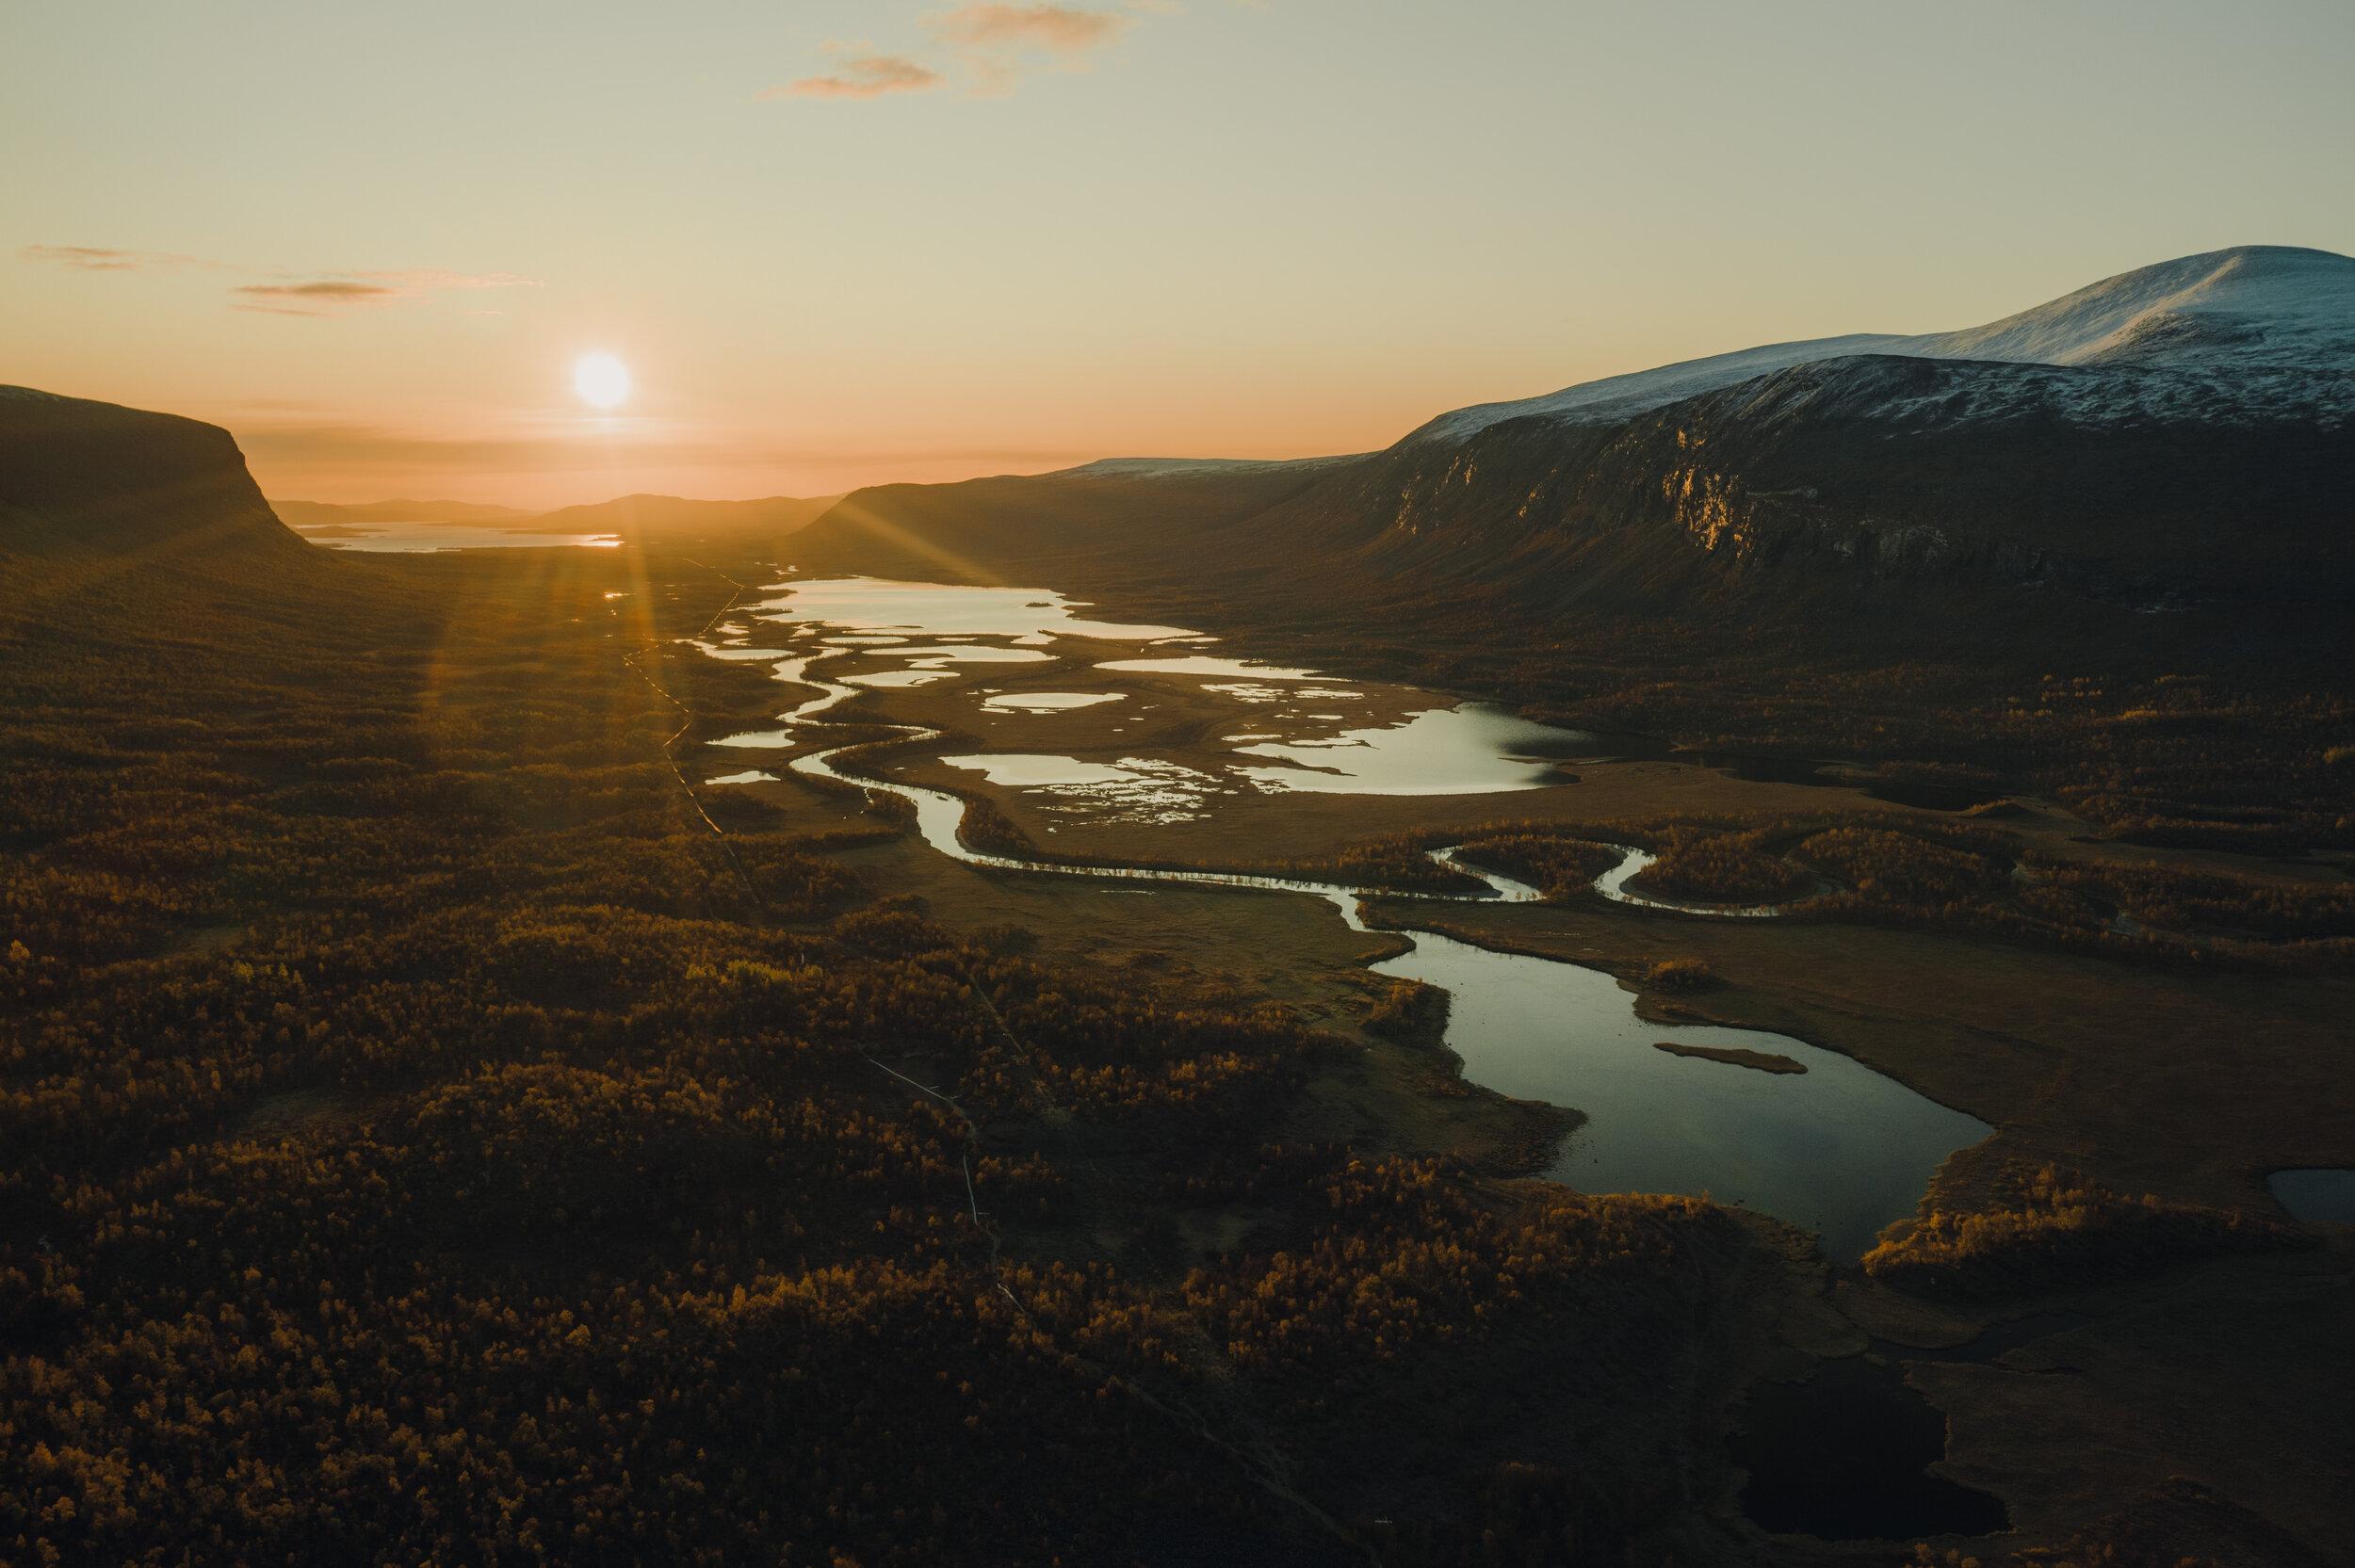 Sunrise over the Láddjuvággi delta.